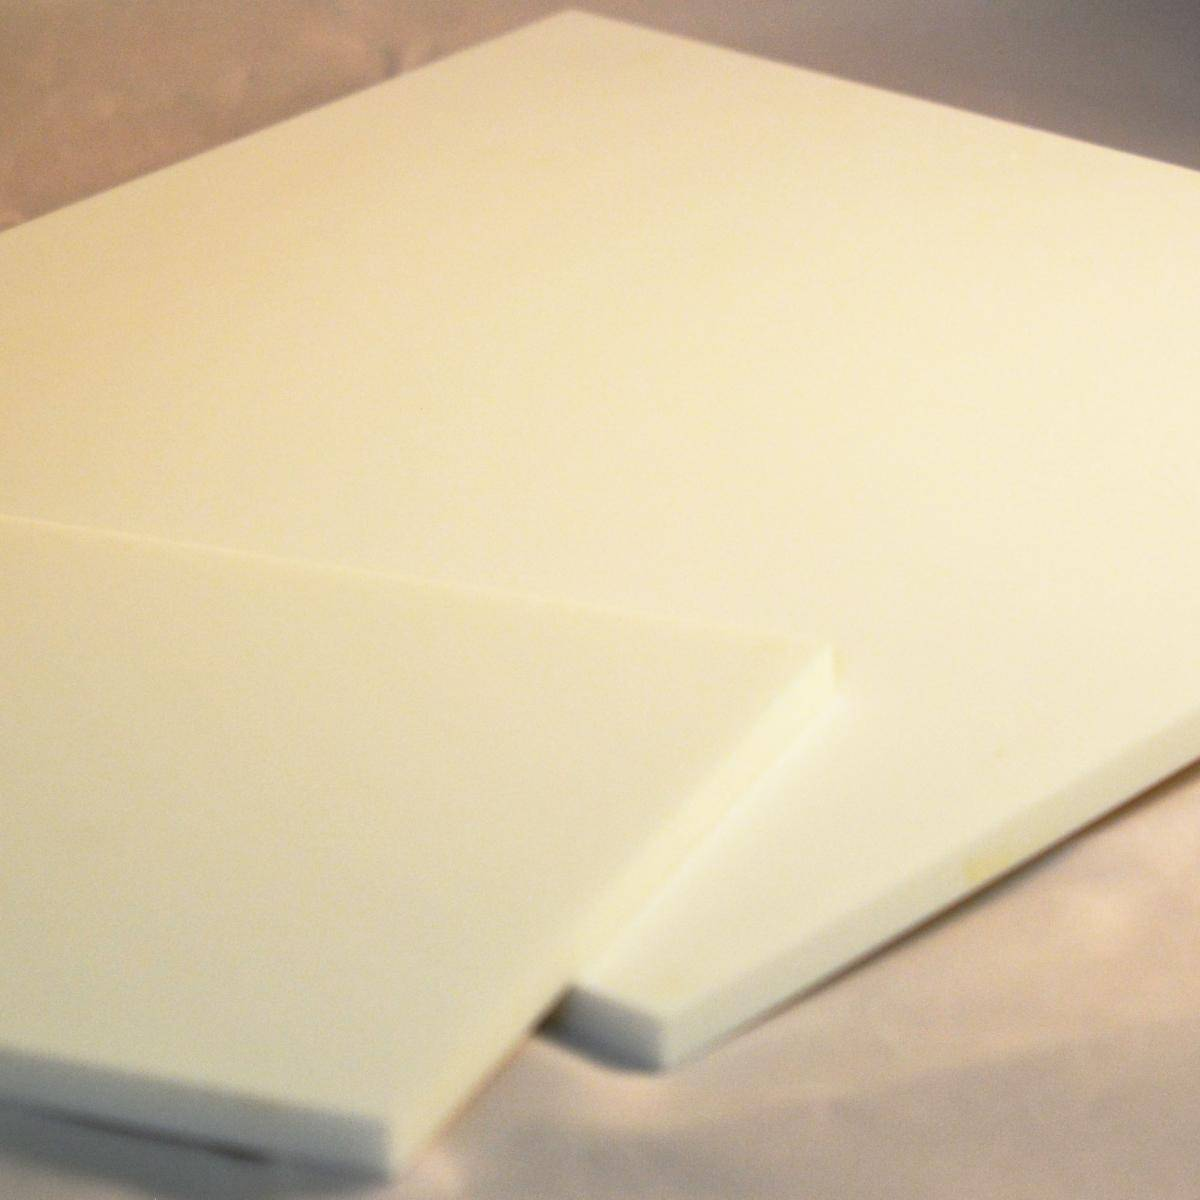 Glass Ceramics 100 x 100 x 5mm Tile